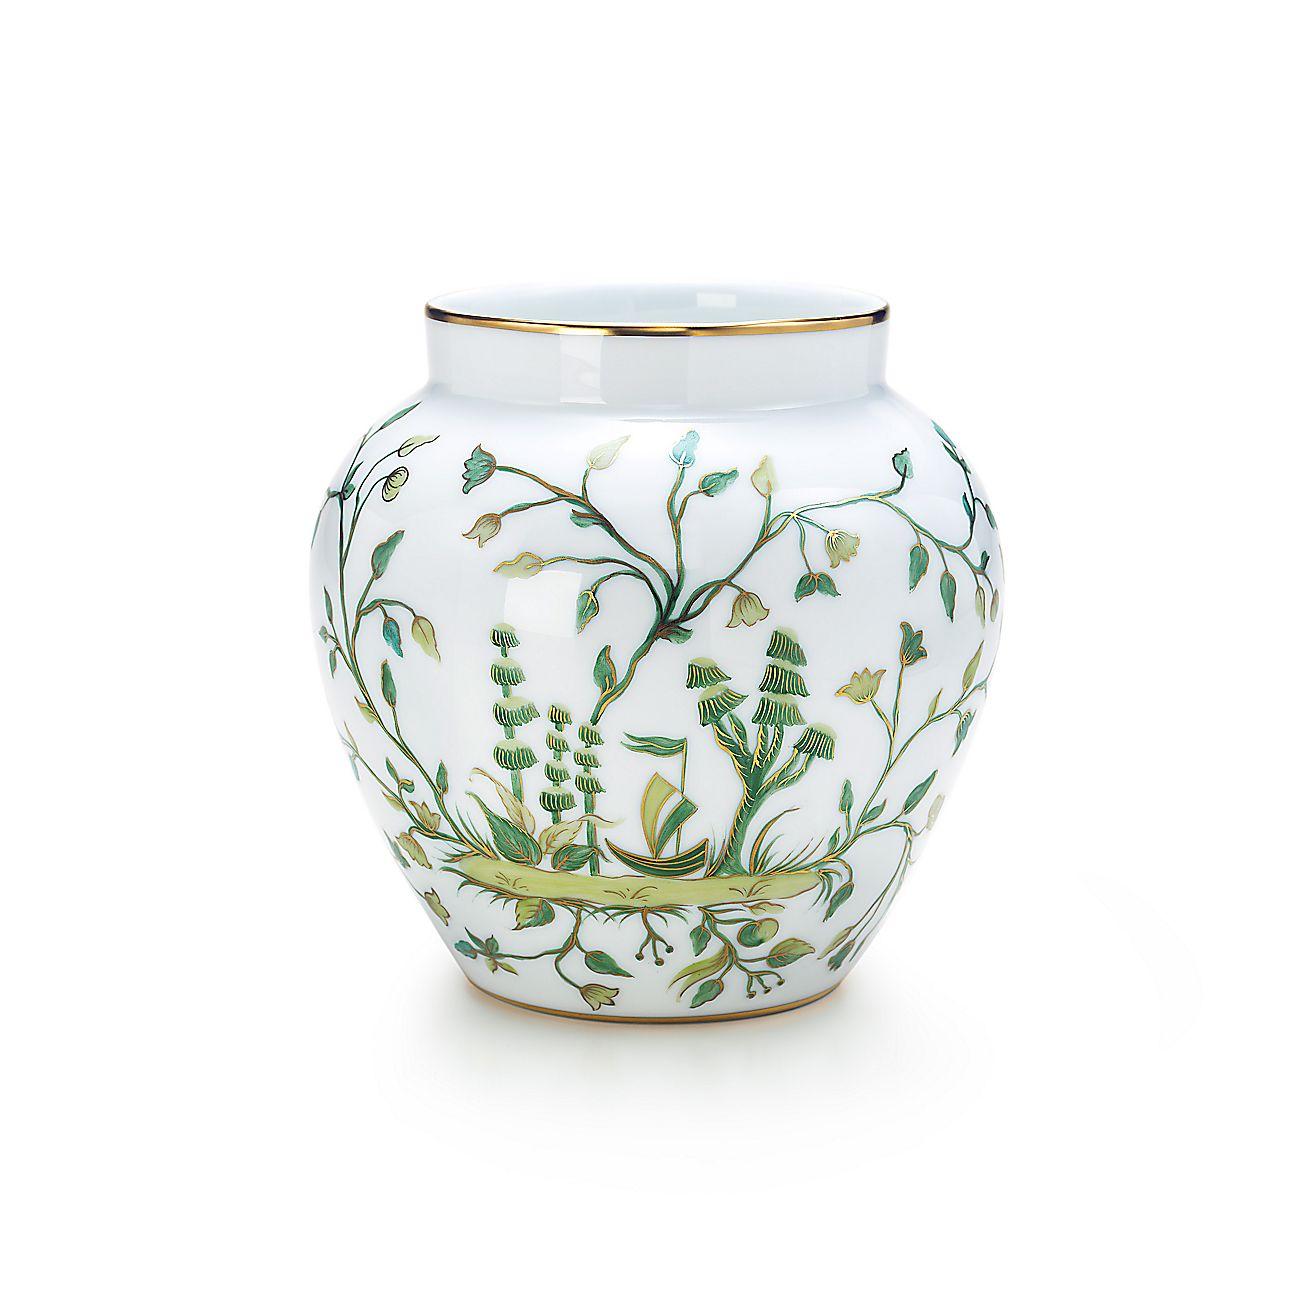 Siam Green:Vase